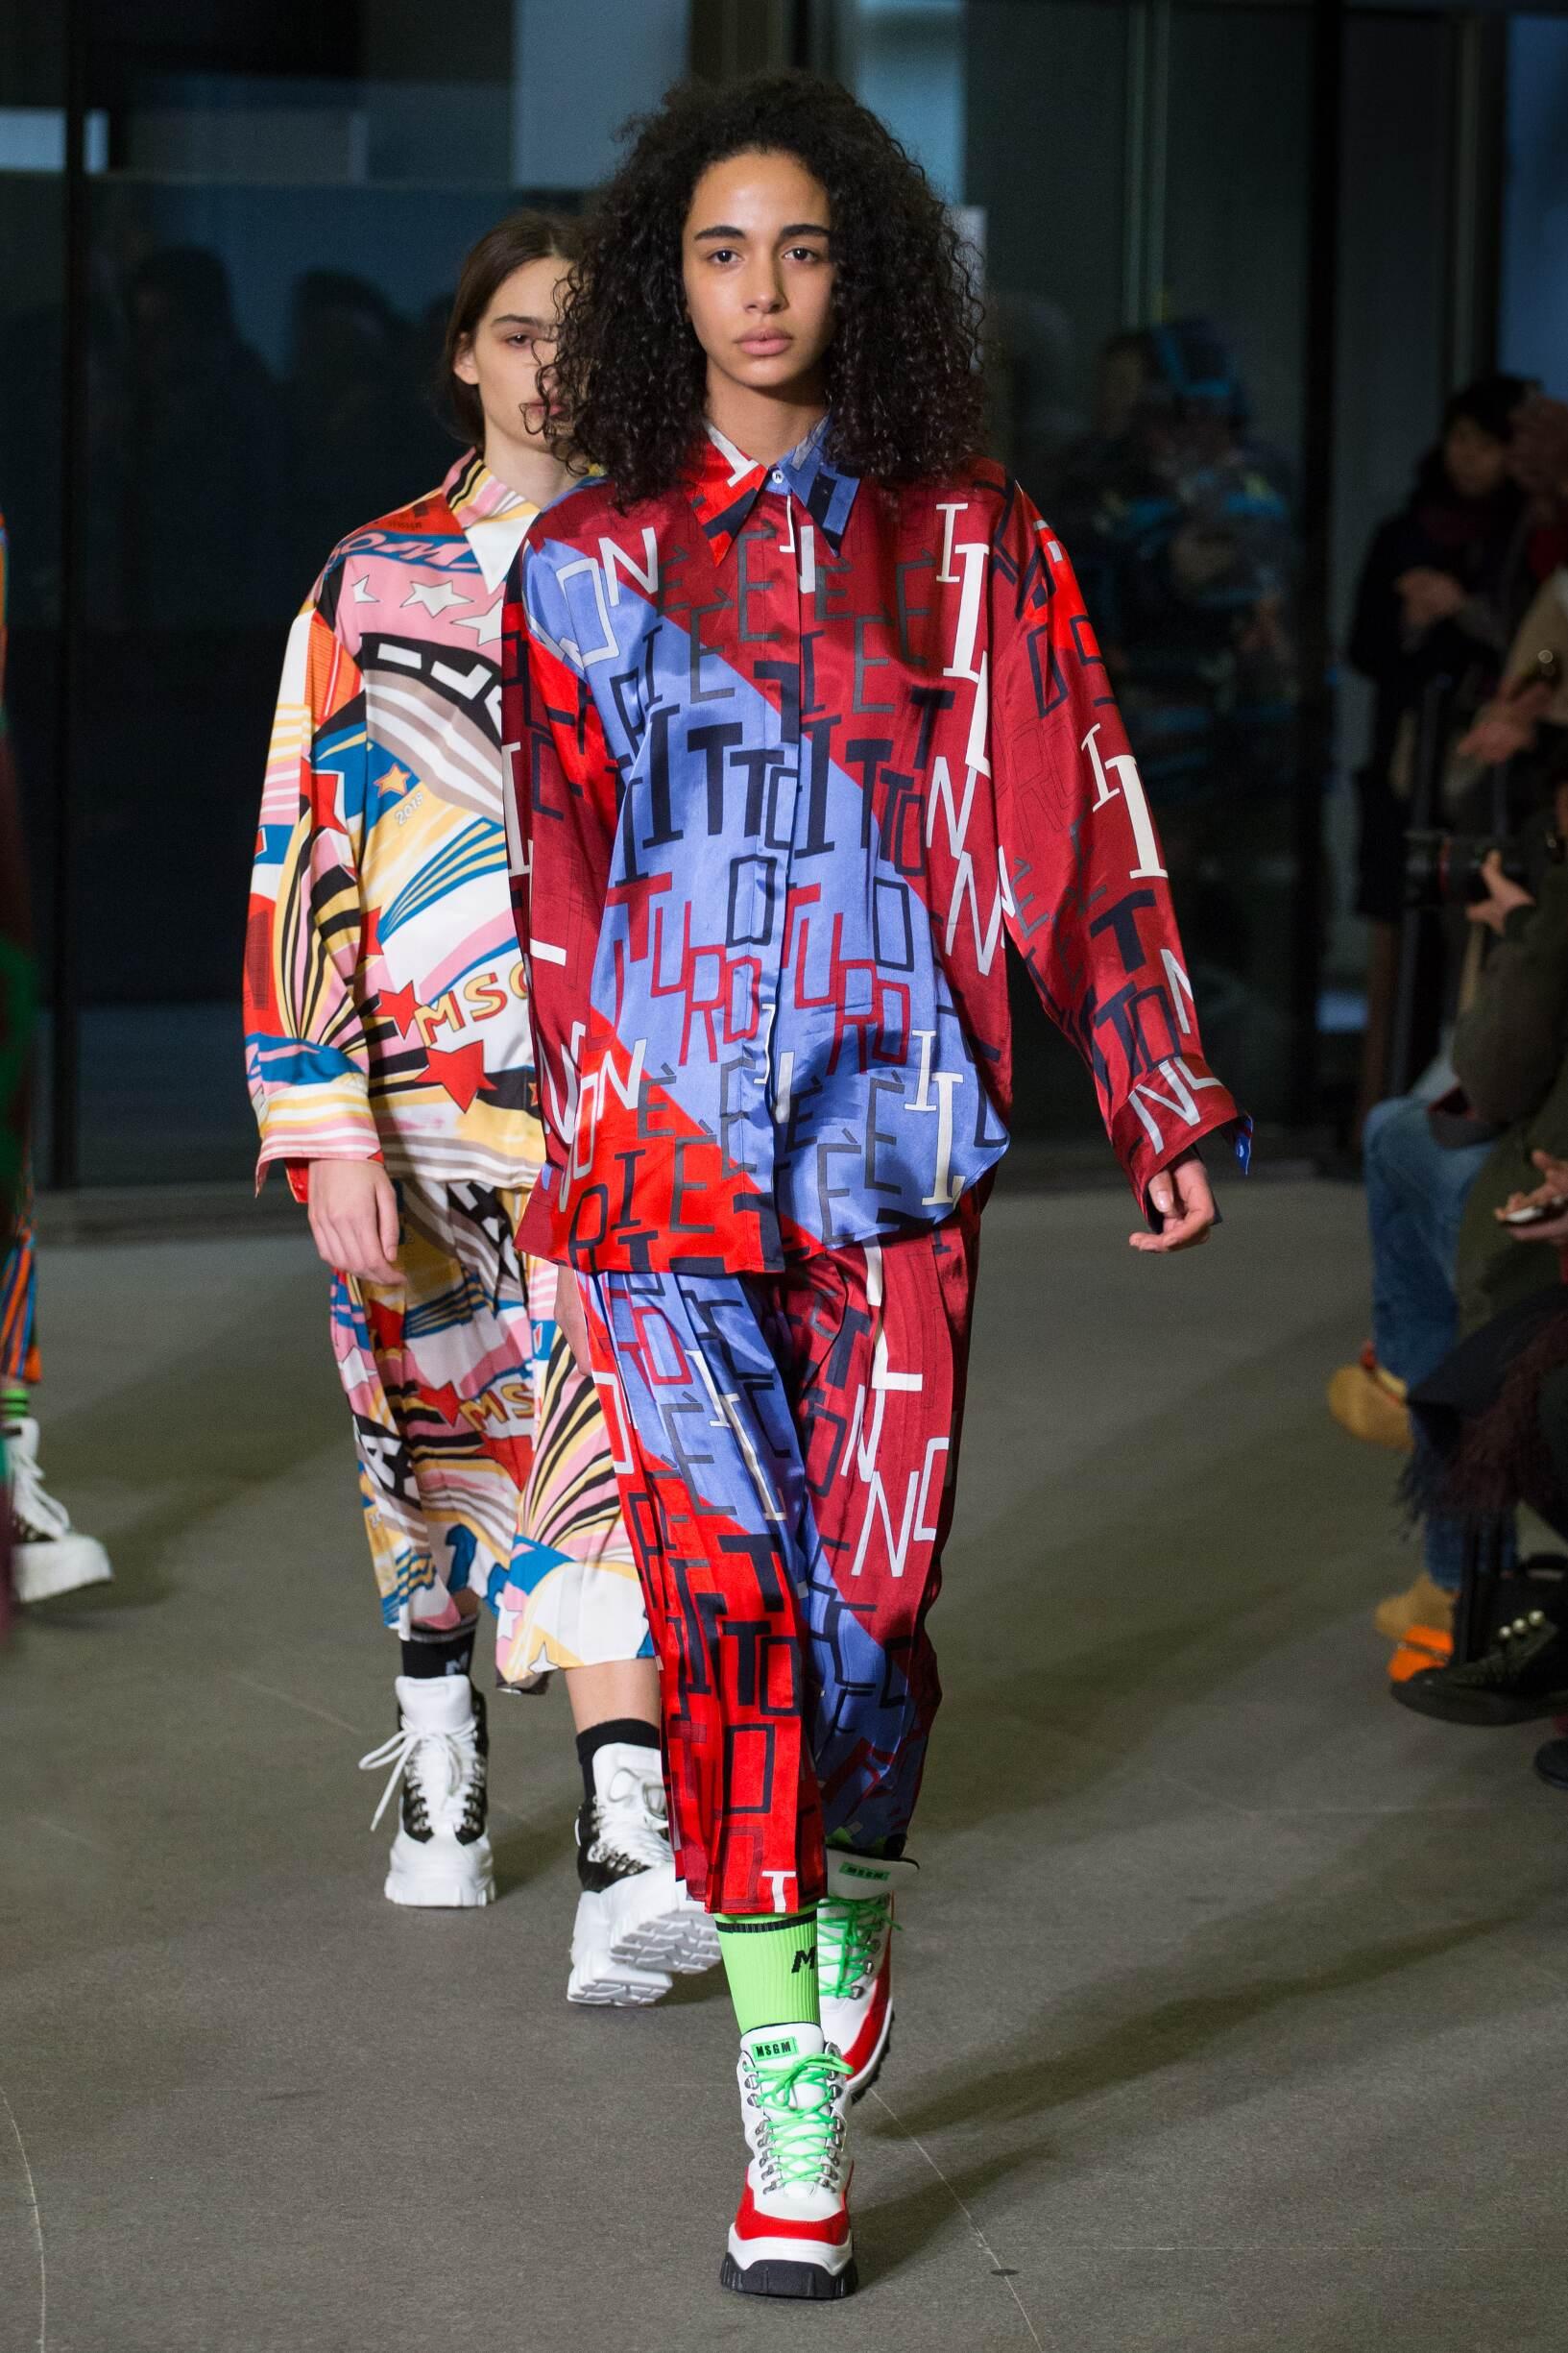 Woman FW 2018-19 Msgm Fashion Show Milan